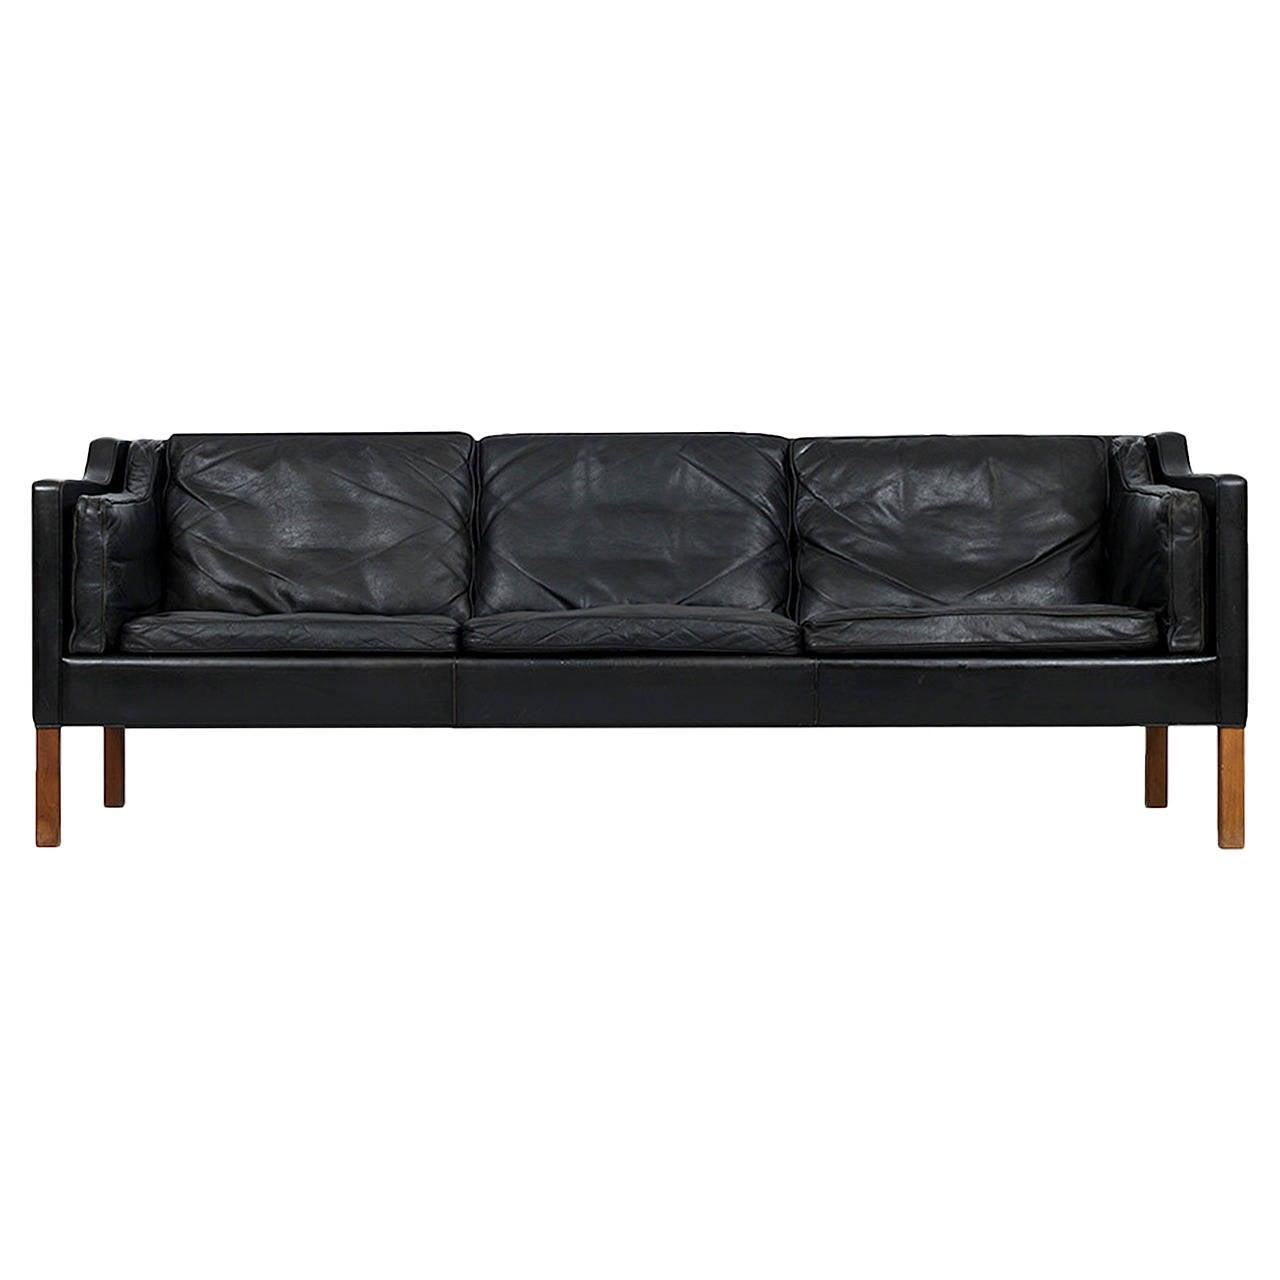 borge mogensen sofa model 2209 corner cover børge 2213 leather by fredericia stolefabrik ...